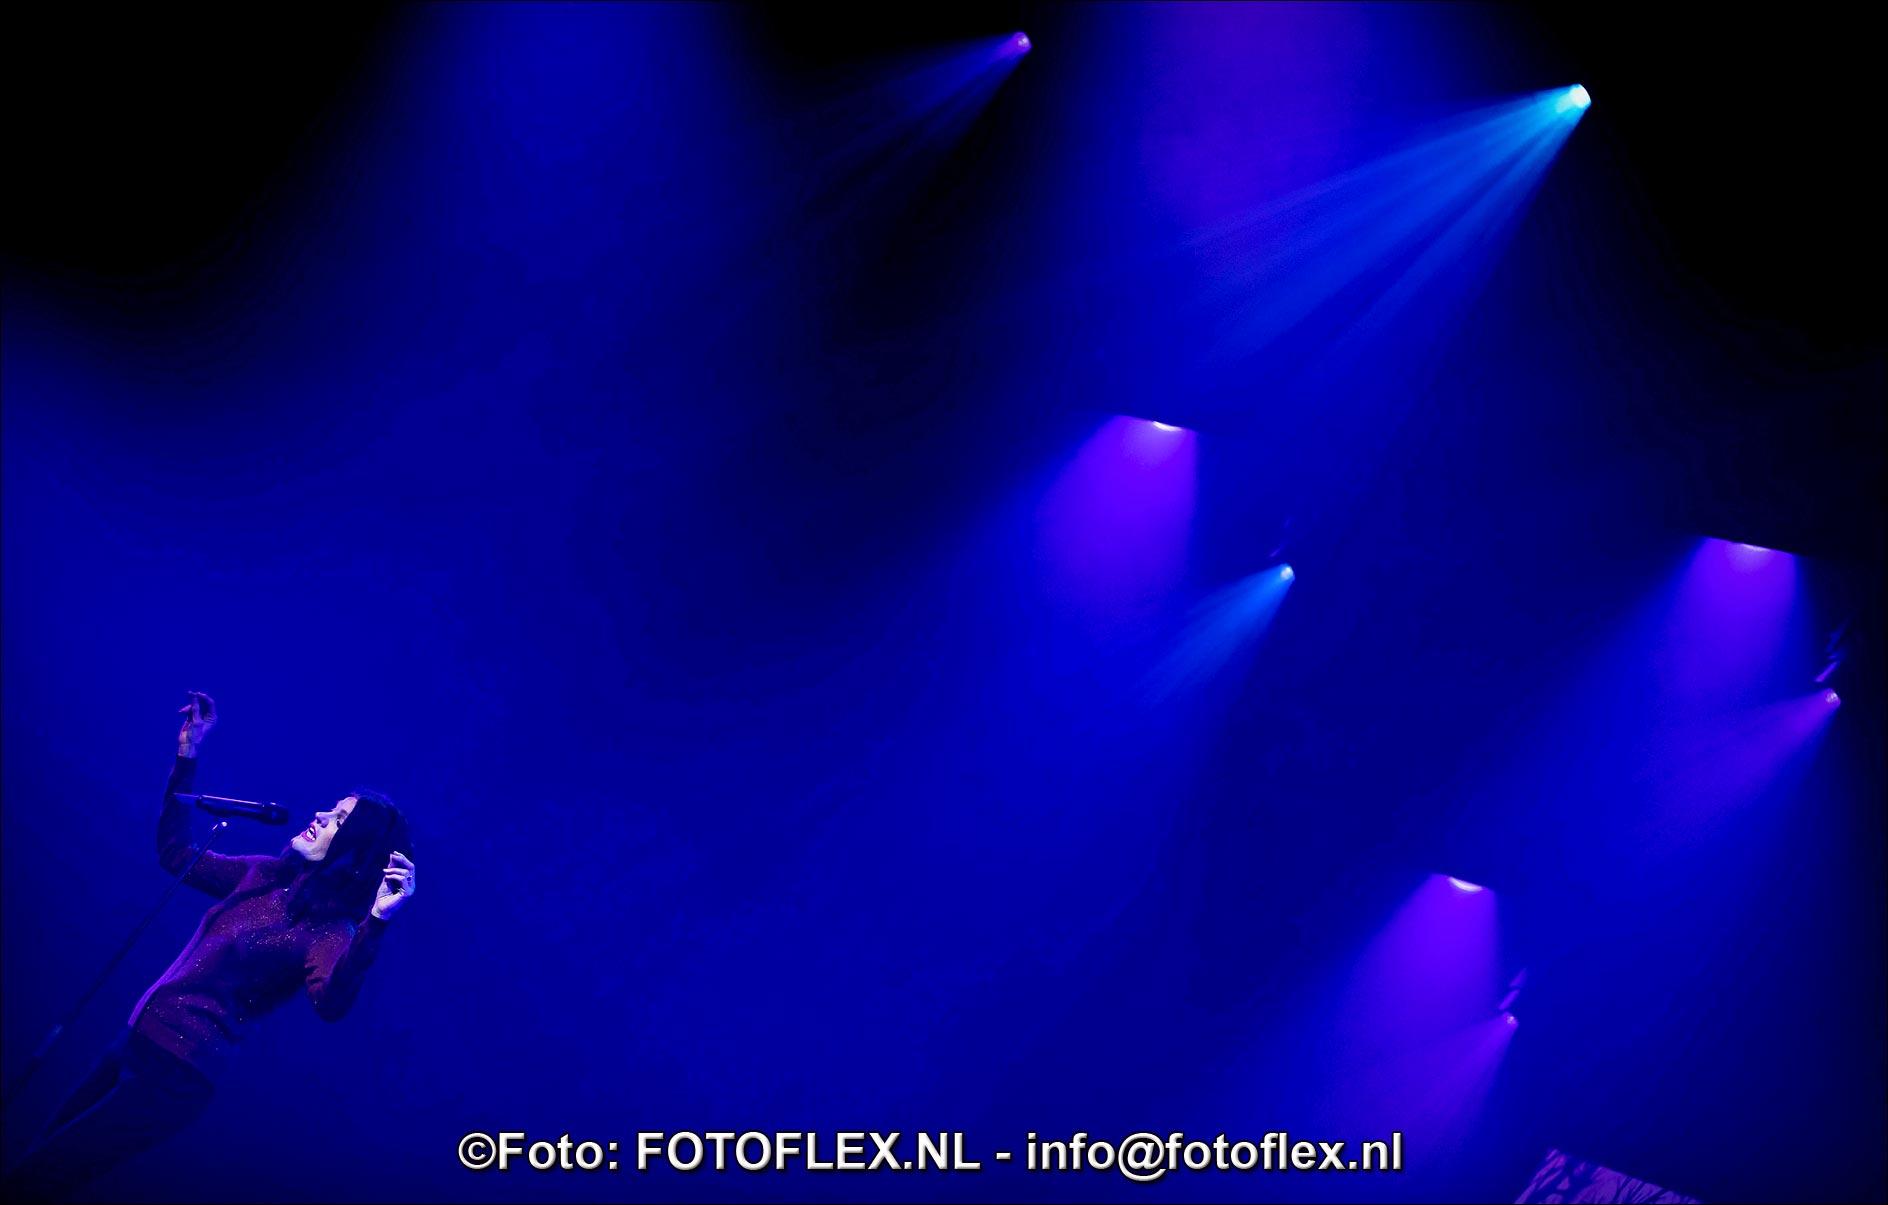 0478-CopyrightFOTOFLEX.NL07012020